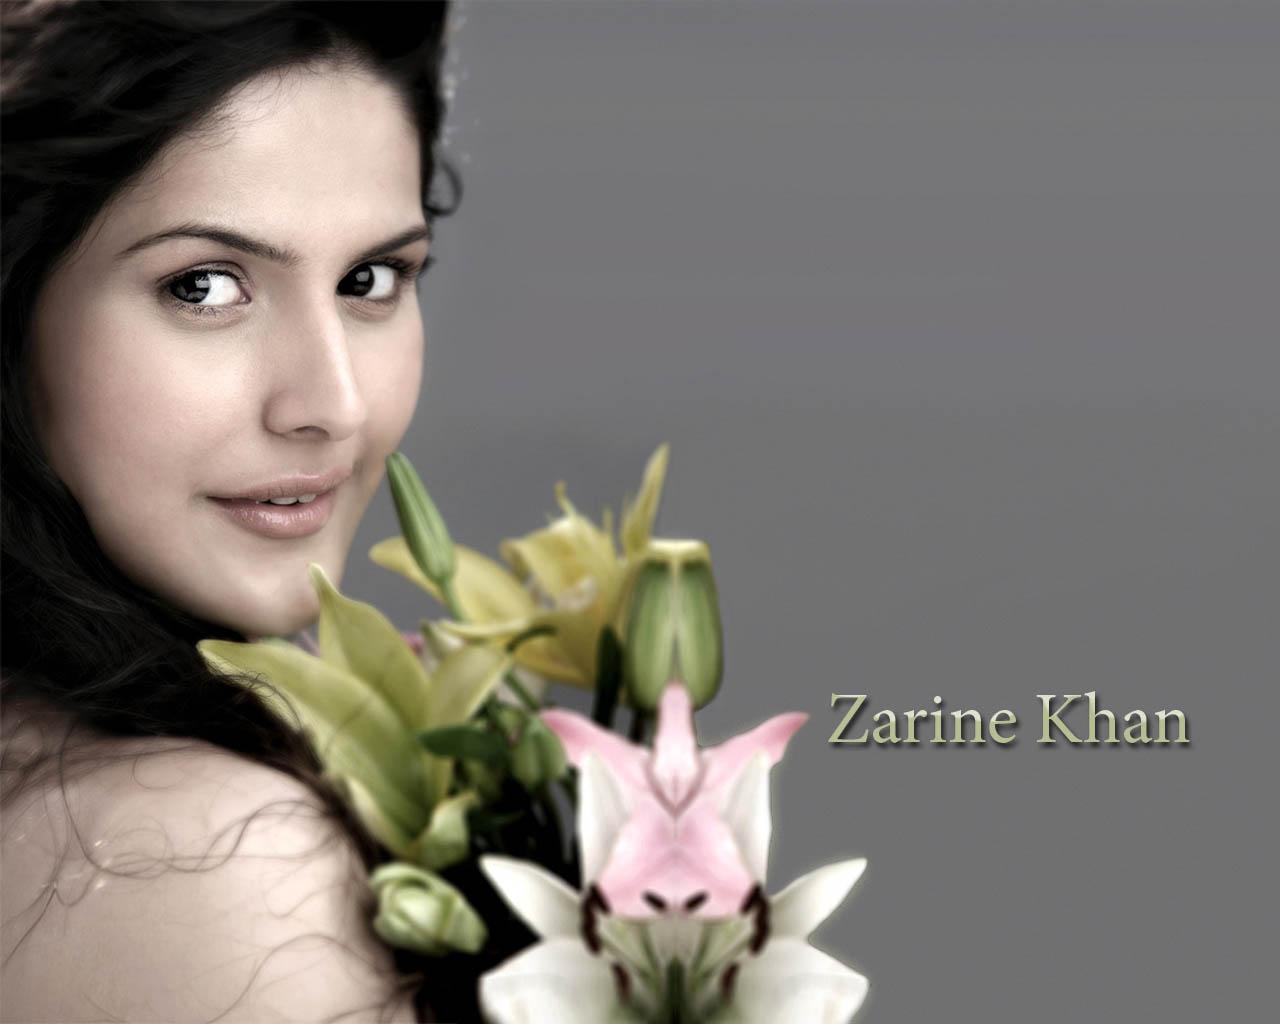 http://3.bp.blogspot.com/_P3pzc8HiI2k/TTf7Kdoxy6I/AAAAAAAACRk/AzJn3OaKgKI/s1600/Zarine+Khan-6.jpg